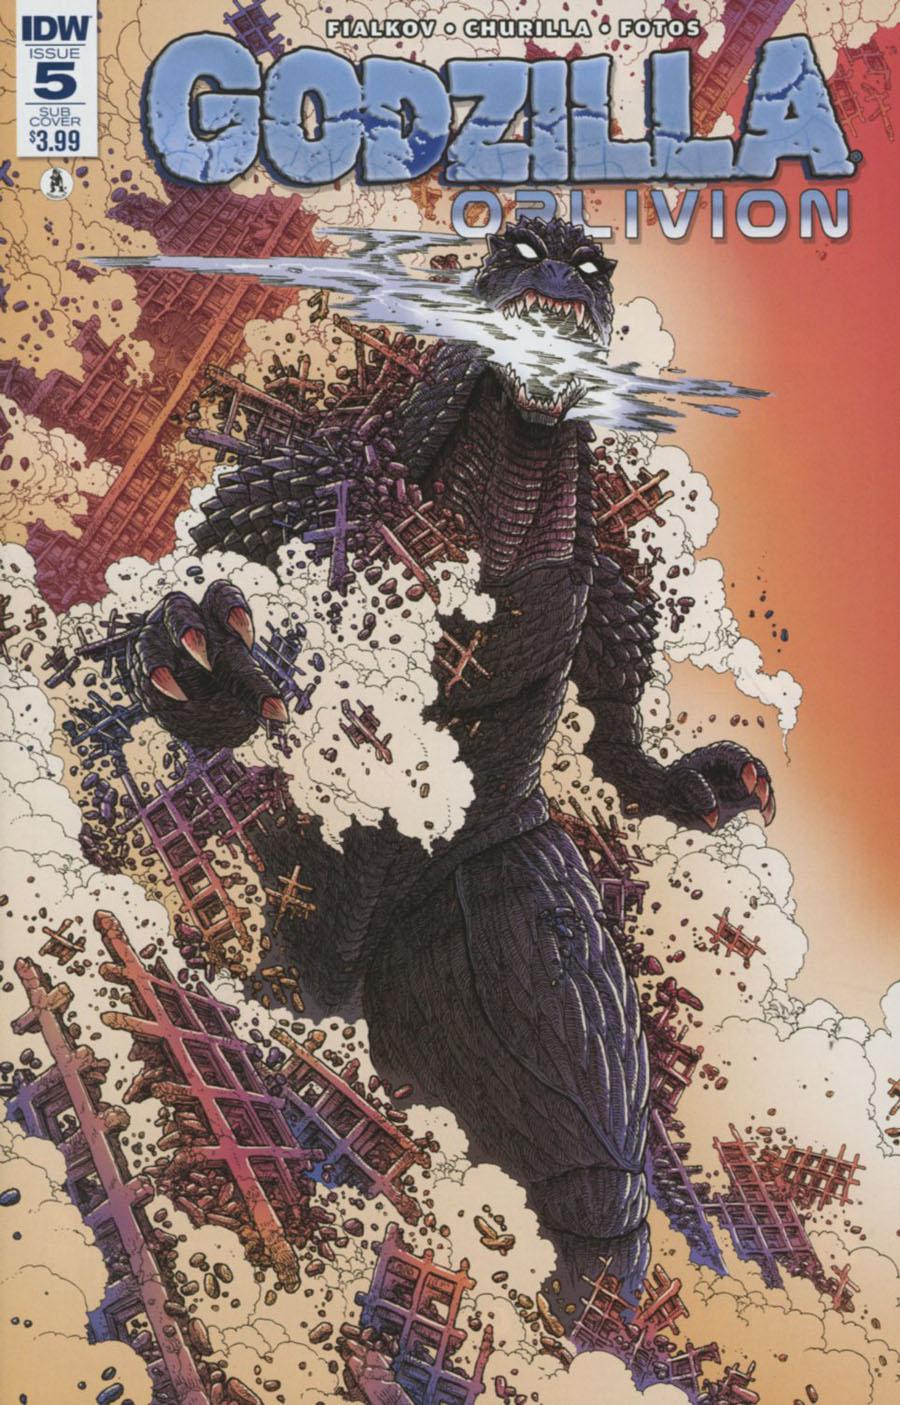 Godzilla Oblivion #5 Cover B Variant James Stokoe Subscription Cover